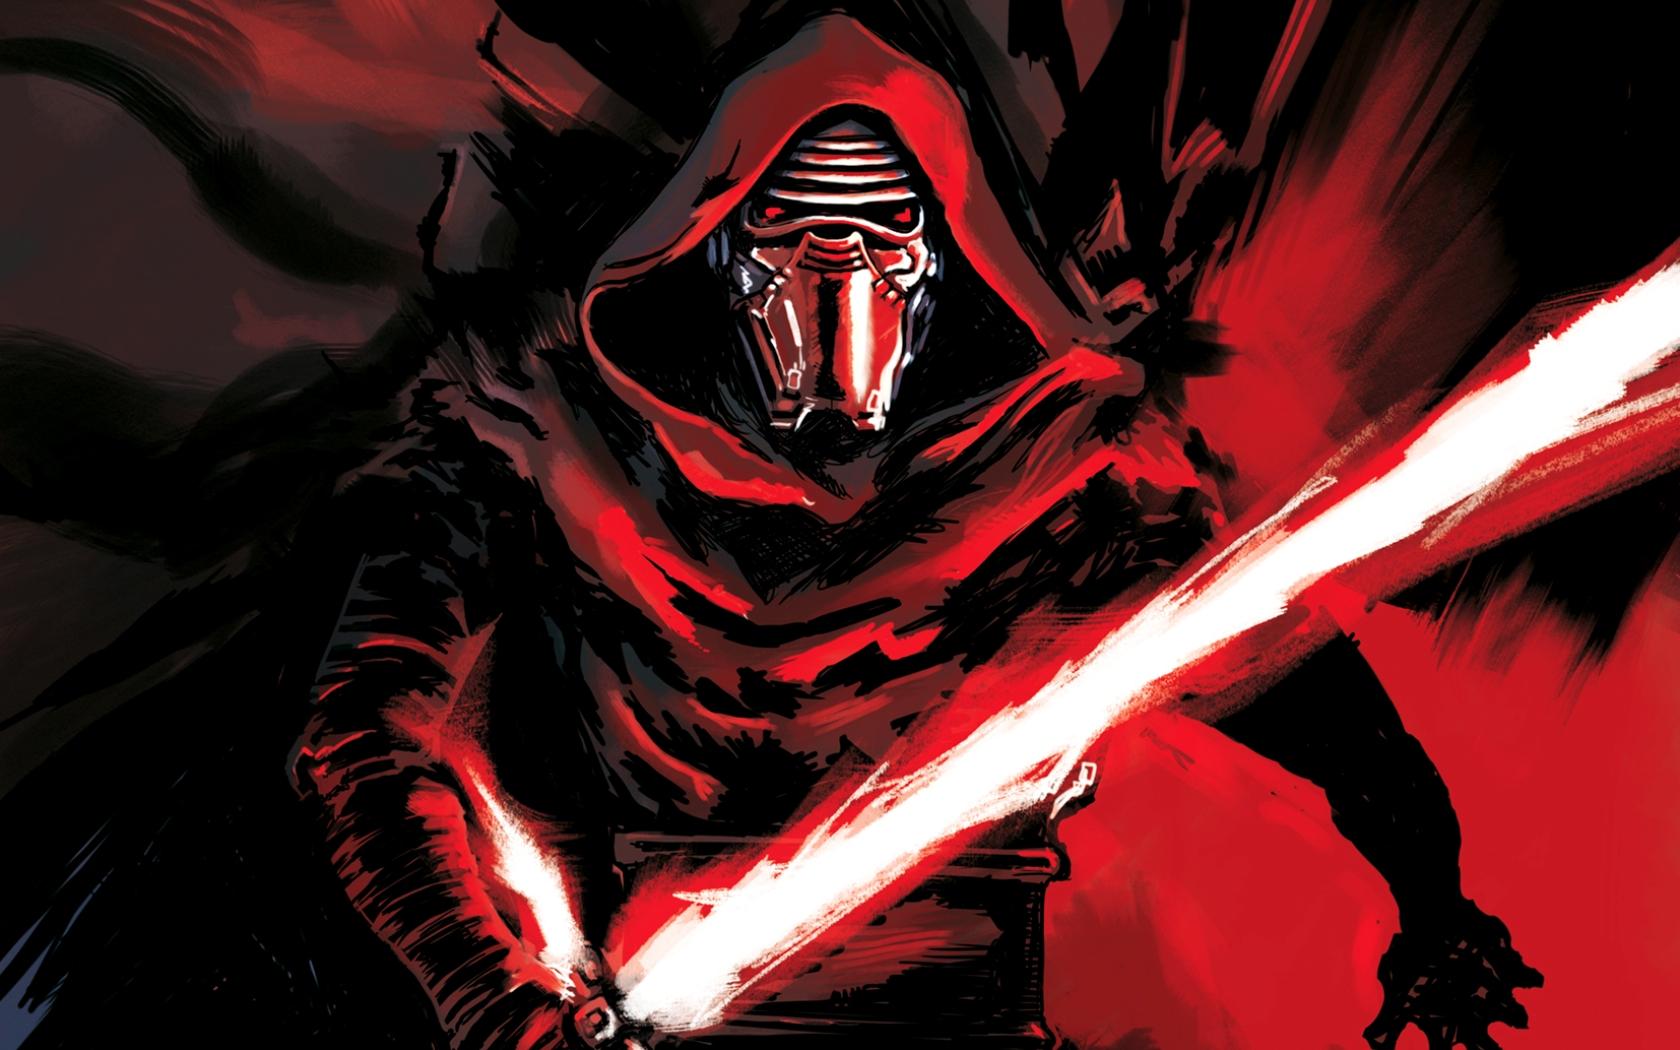 Star Wars The Force Awakens Kylo Ren